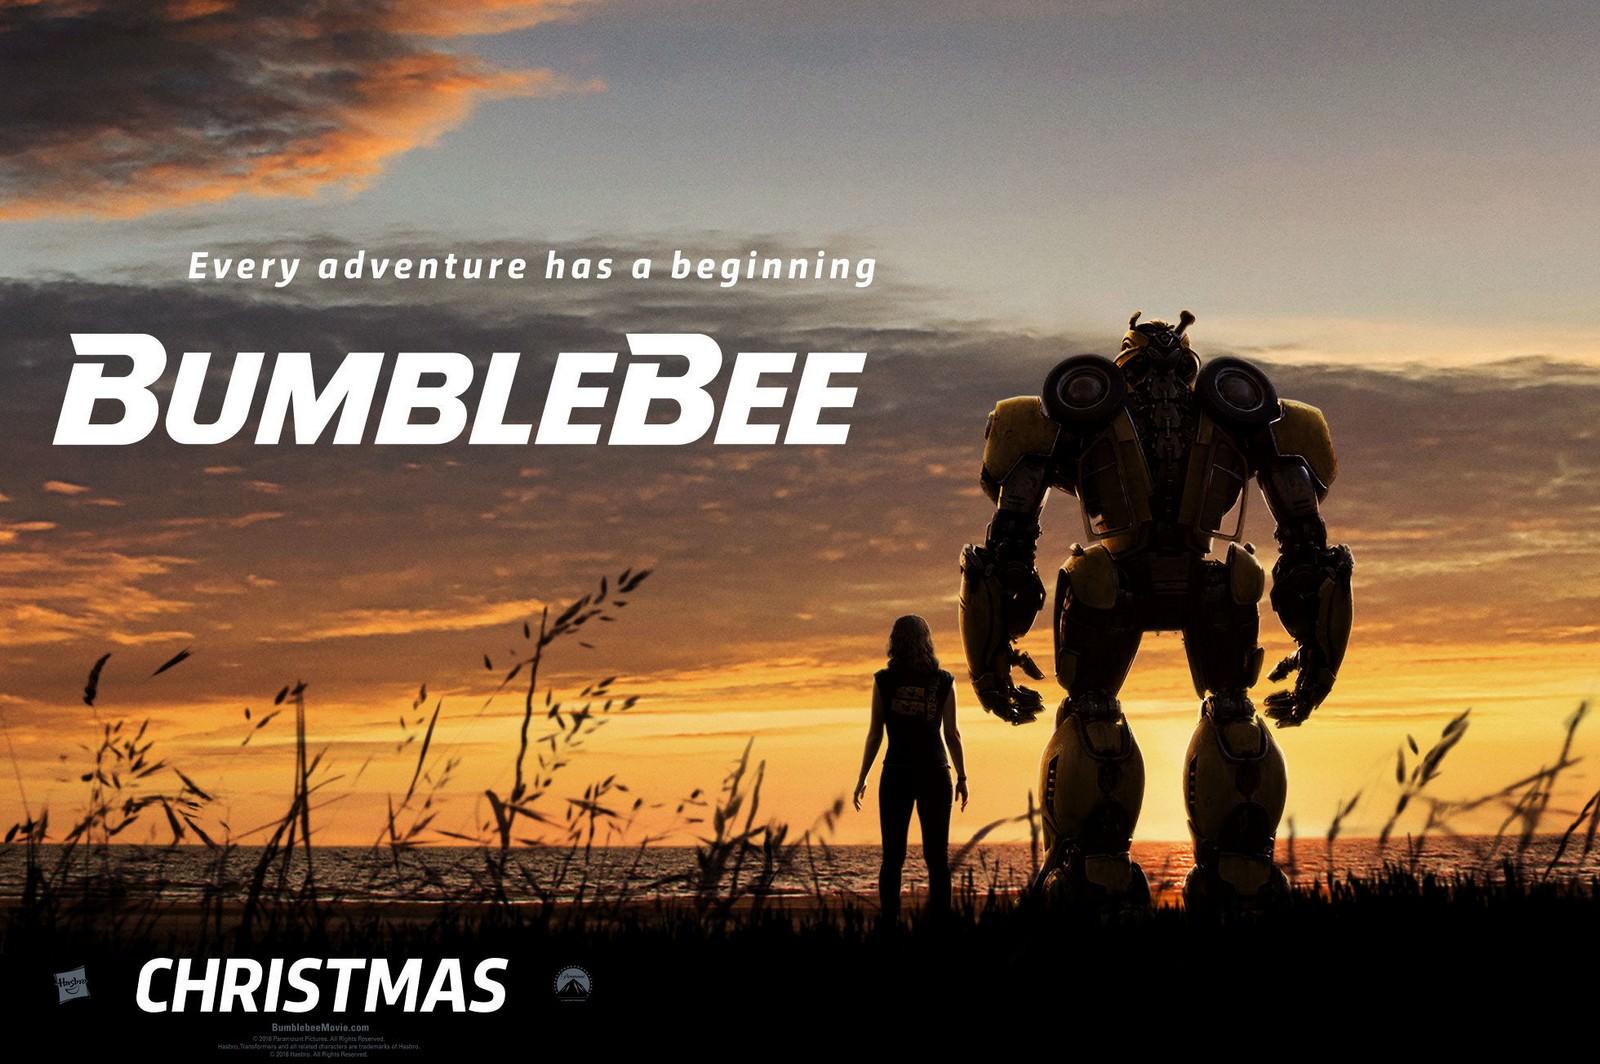 Movie, Bumblebee(美國, 2018年) / 大黃蜂(台灣.香港) / 大黄蜂(中國), 電影海報, 美國, 橫版